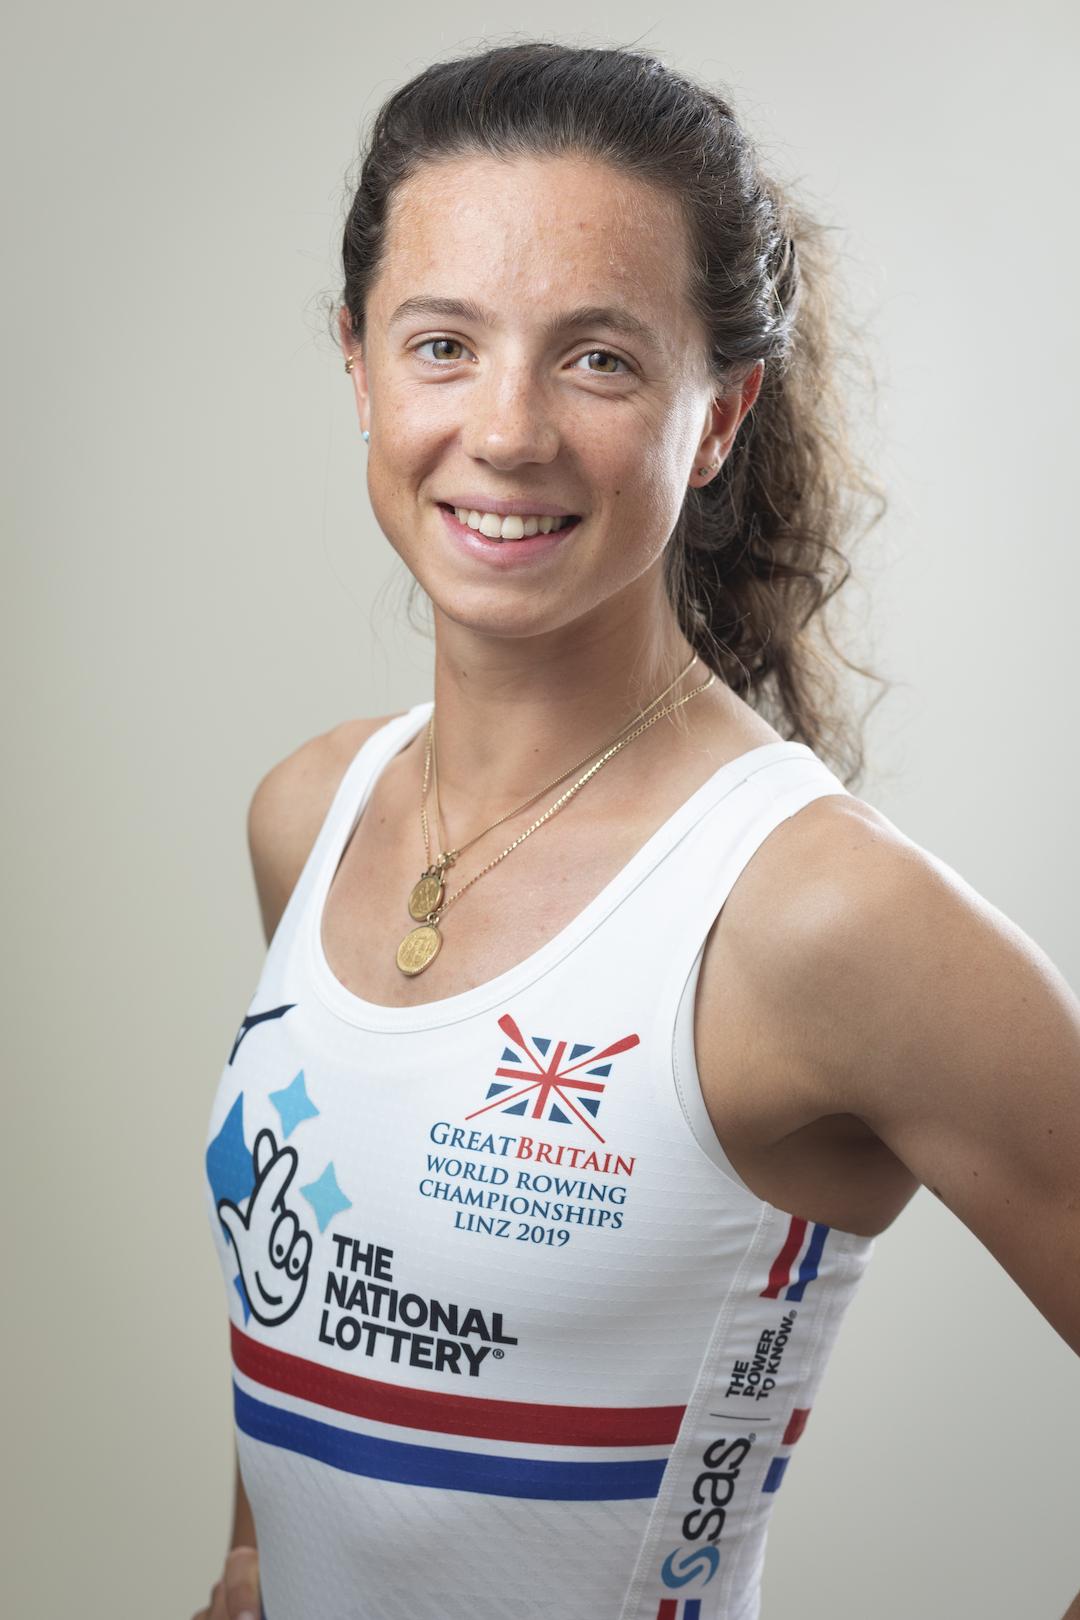 Imogen Grant profile image